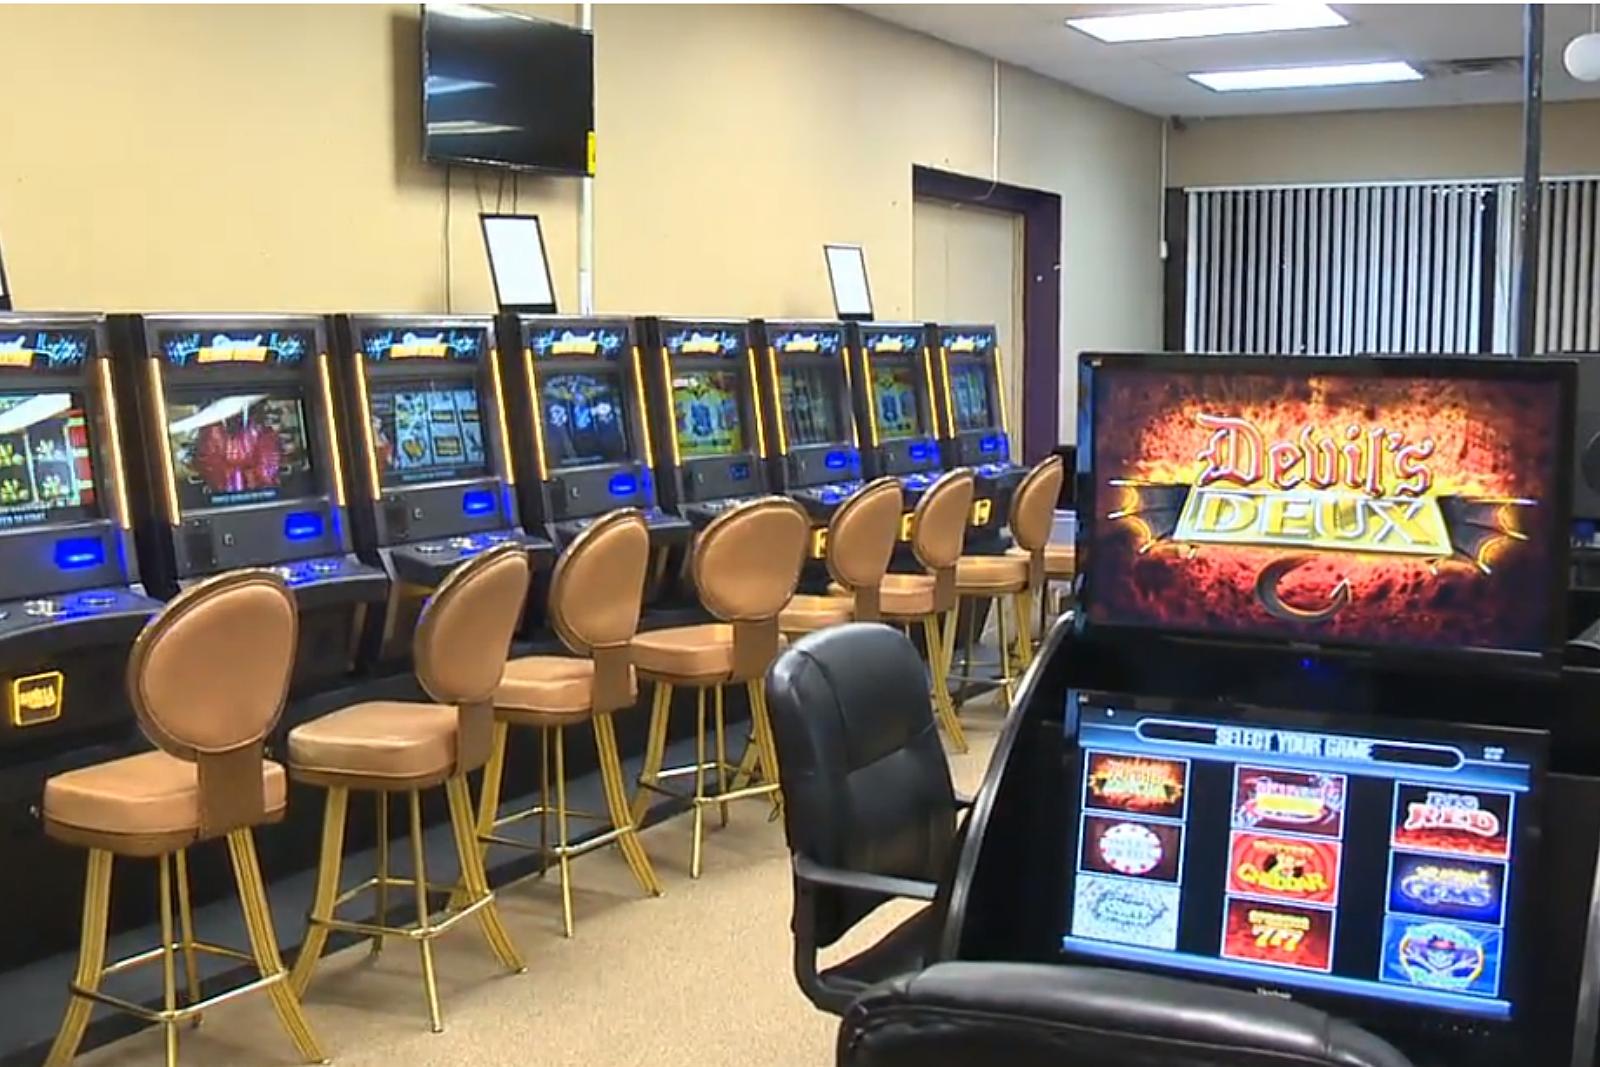 Adult arcade